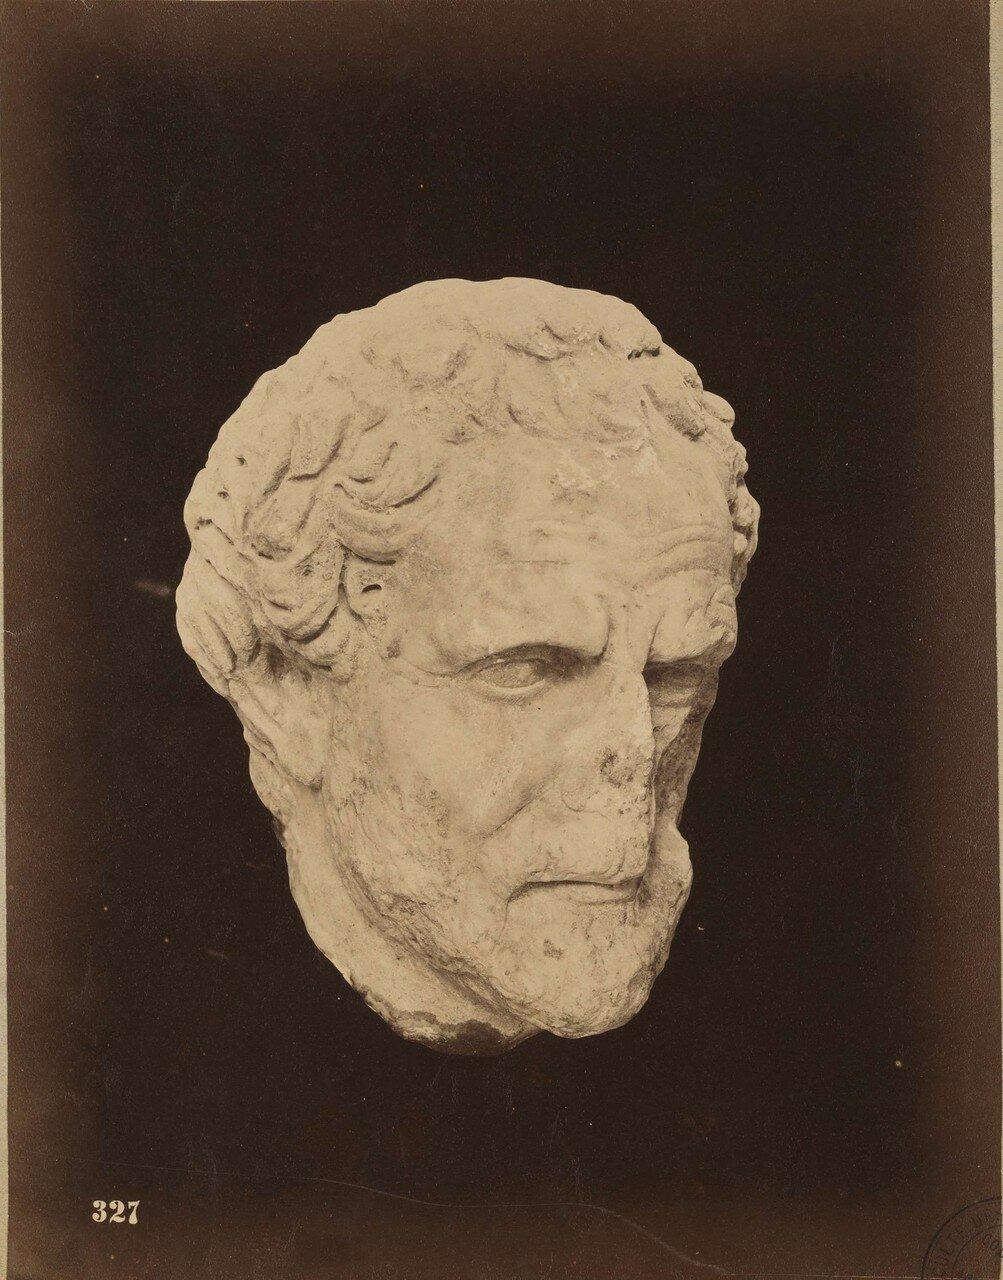 124. Голова философа (фрагмент)